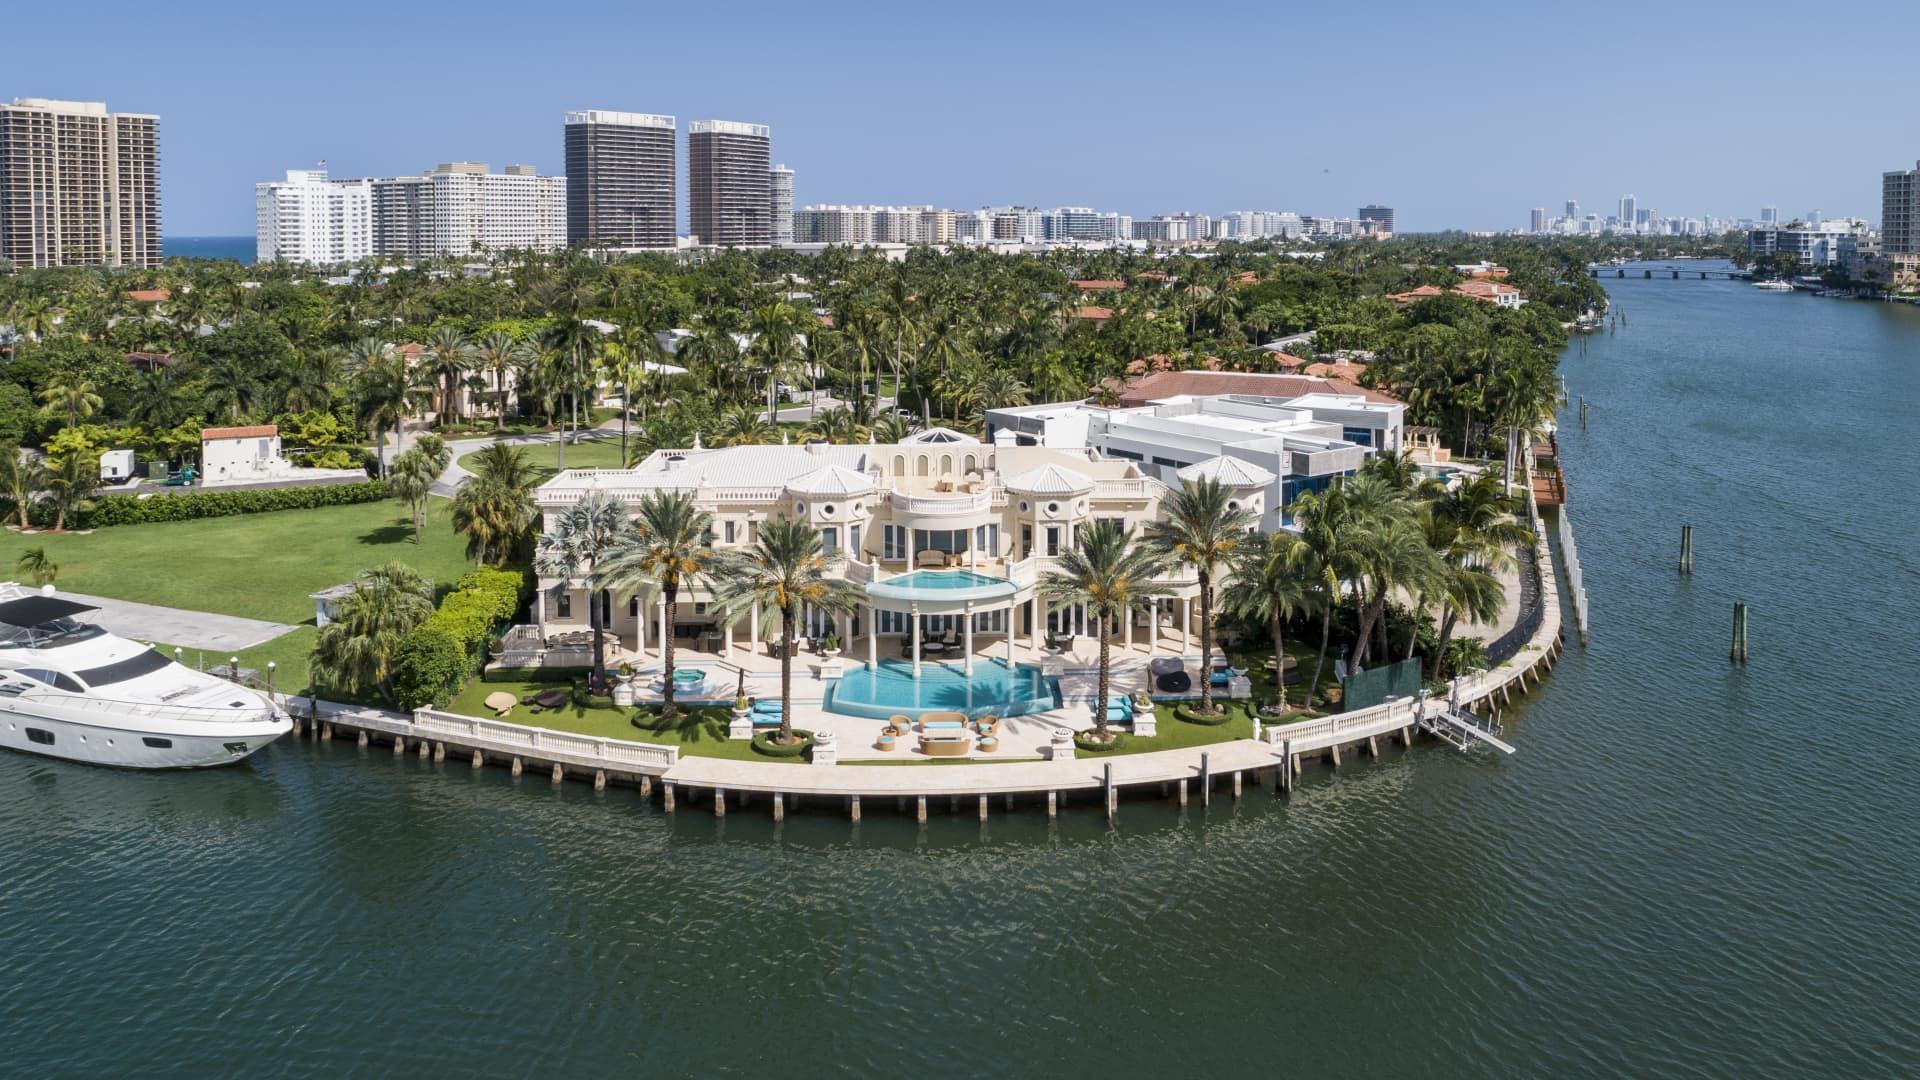 Villa Magnolia's water frontage spans 221 ft.